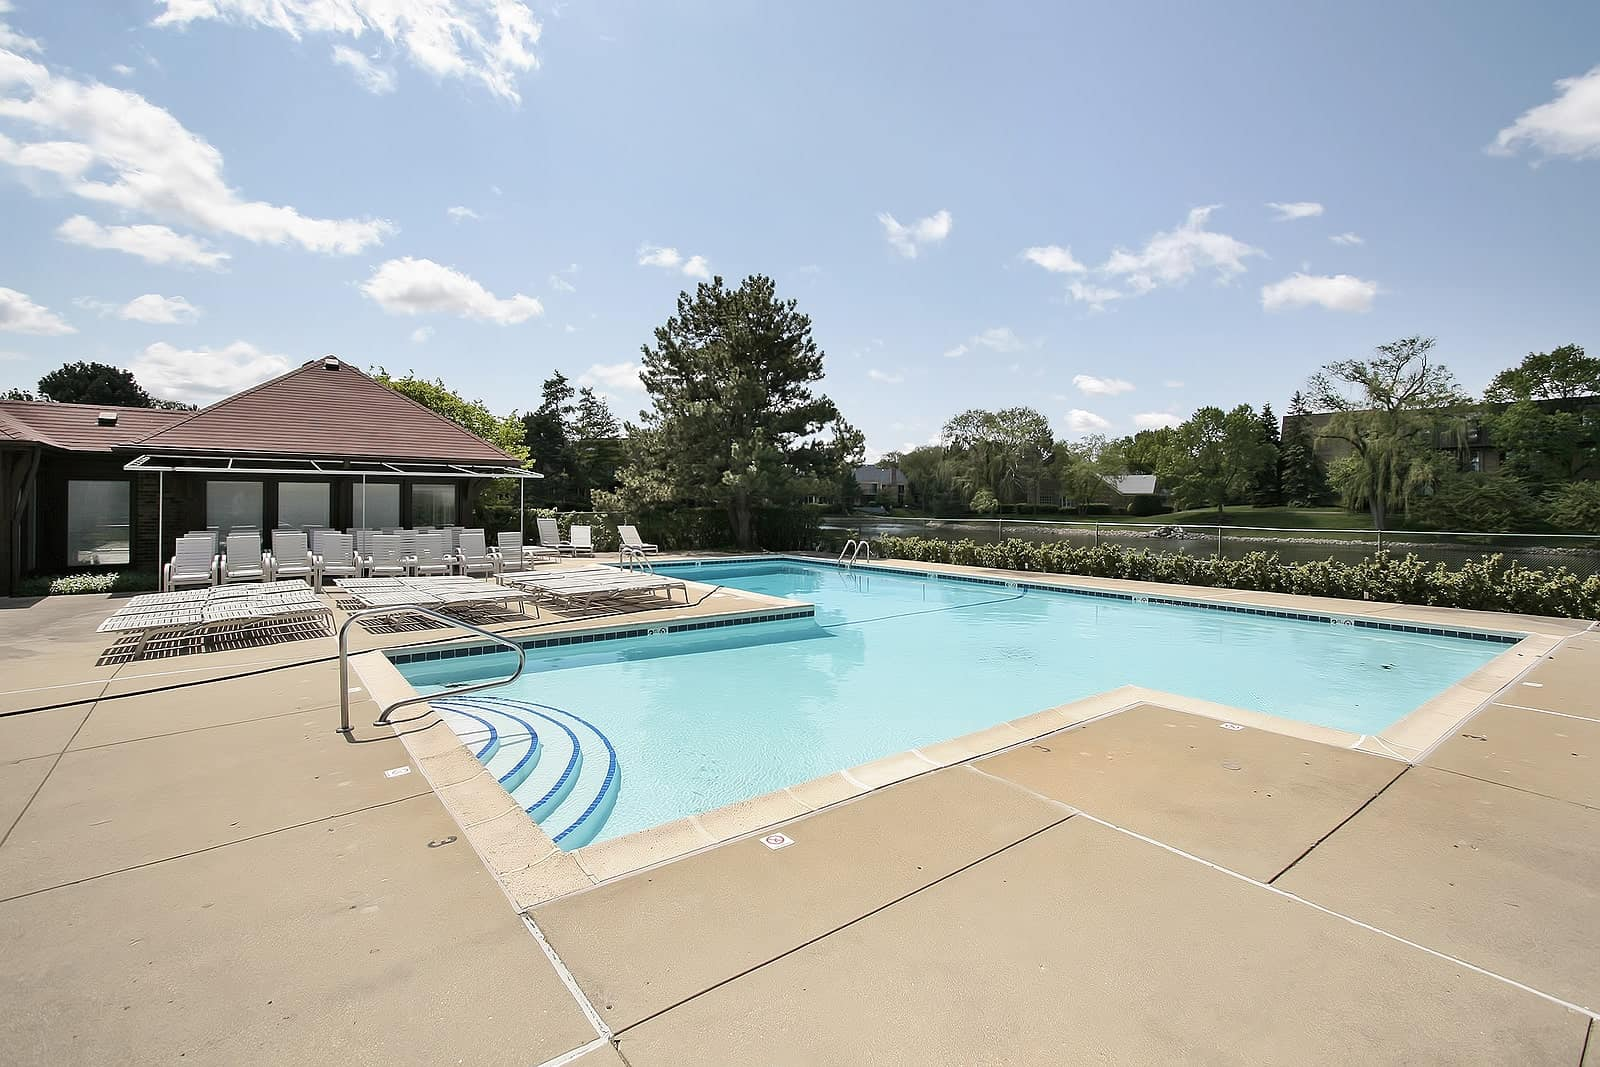 Florida Pool Deck Resurfacing